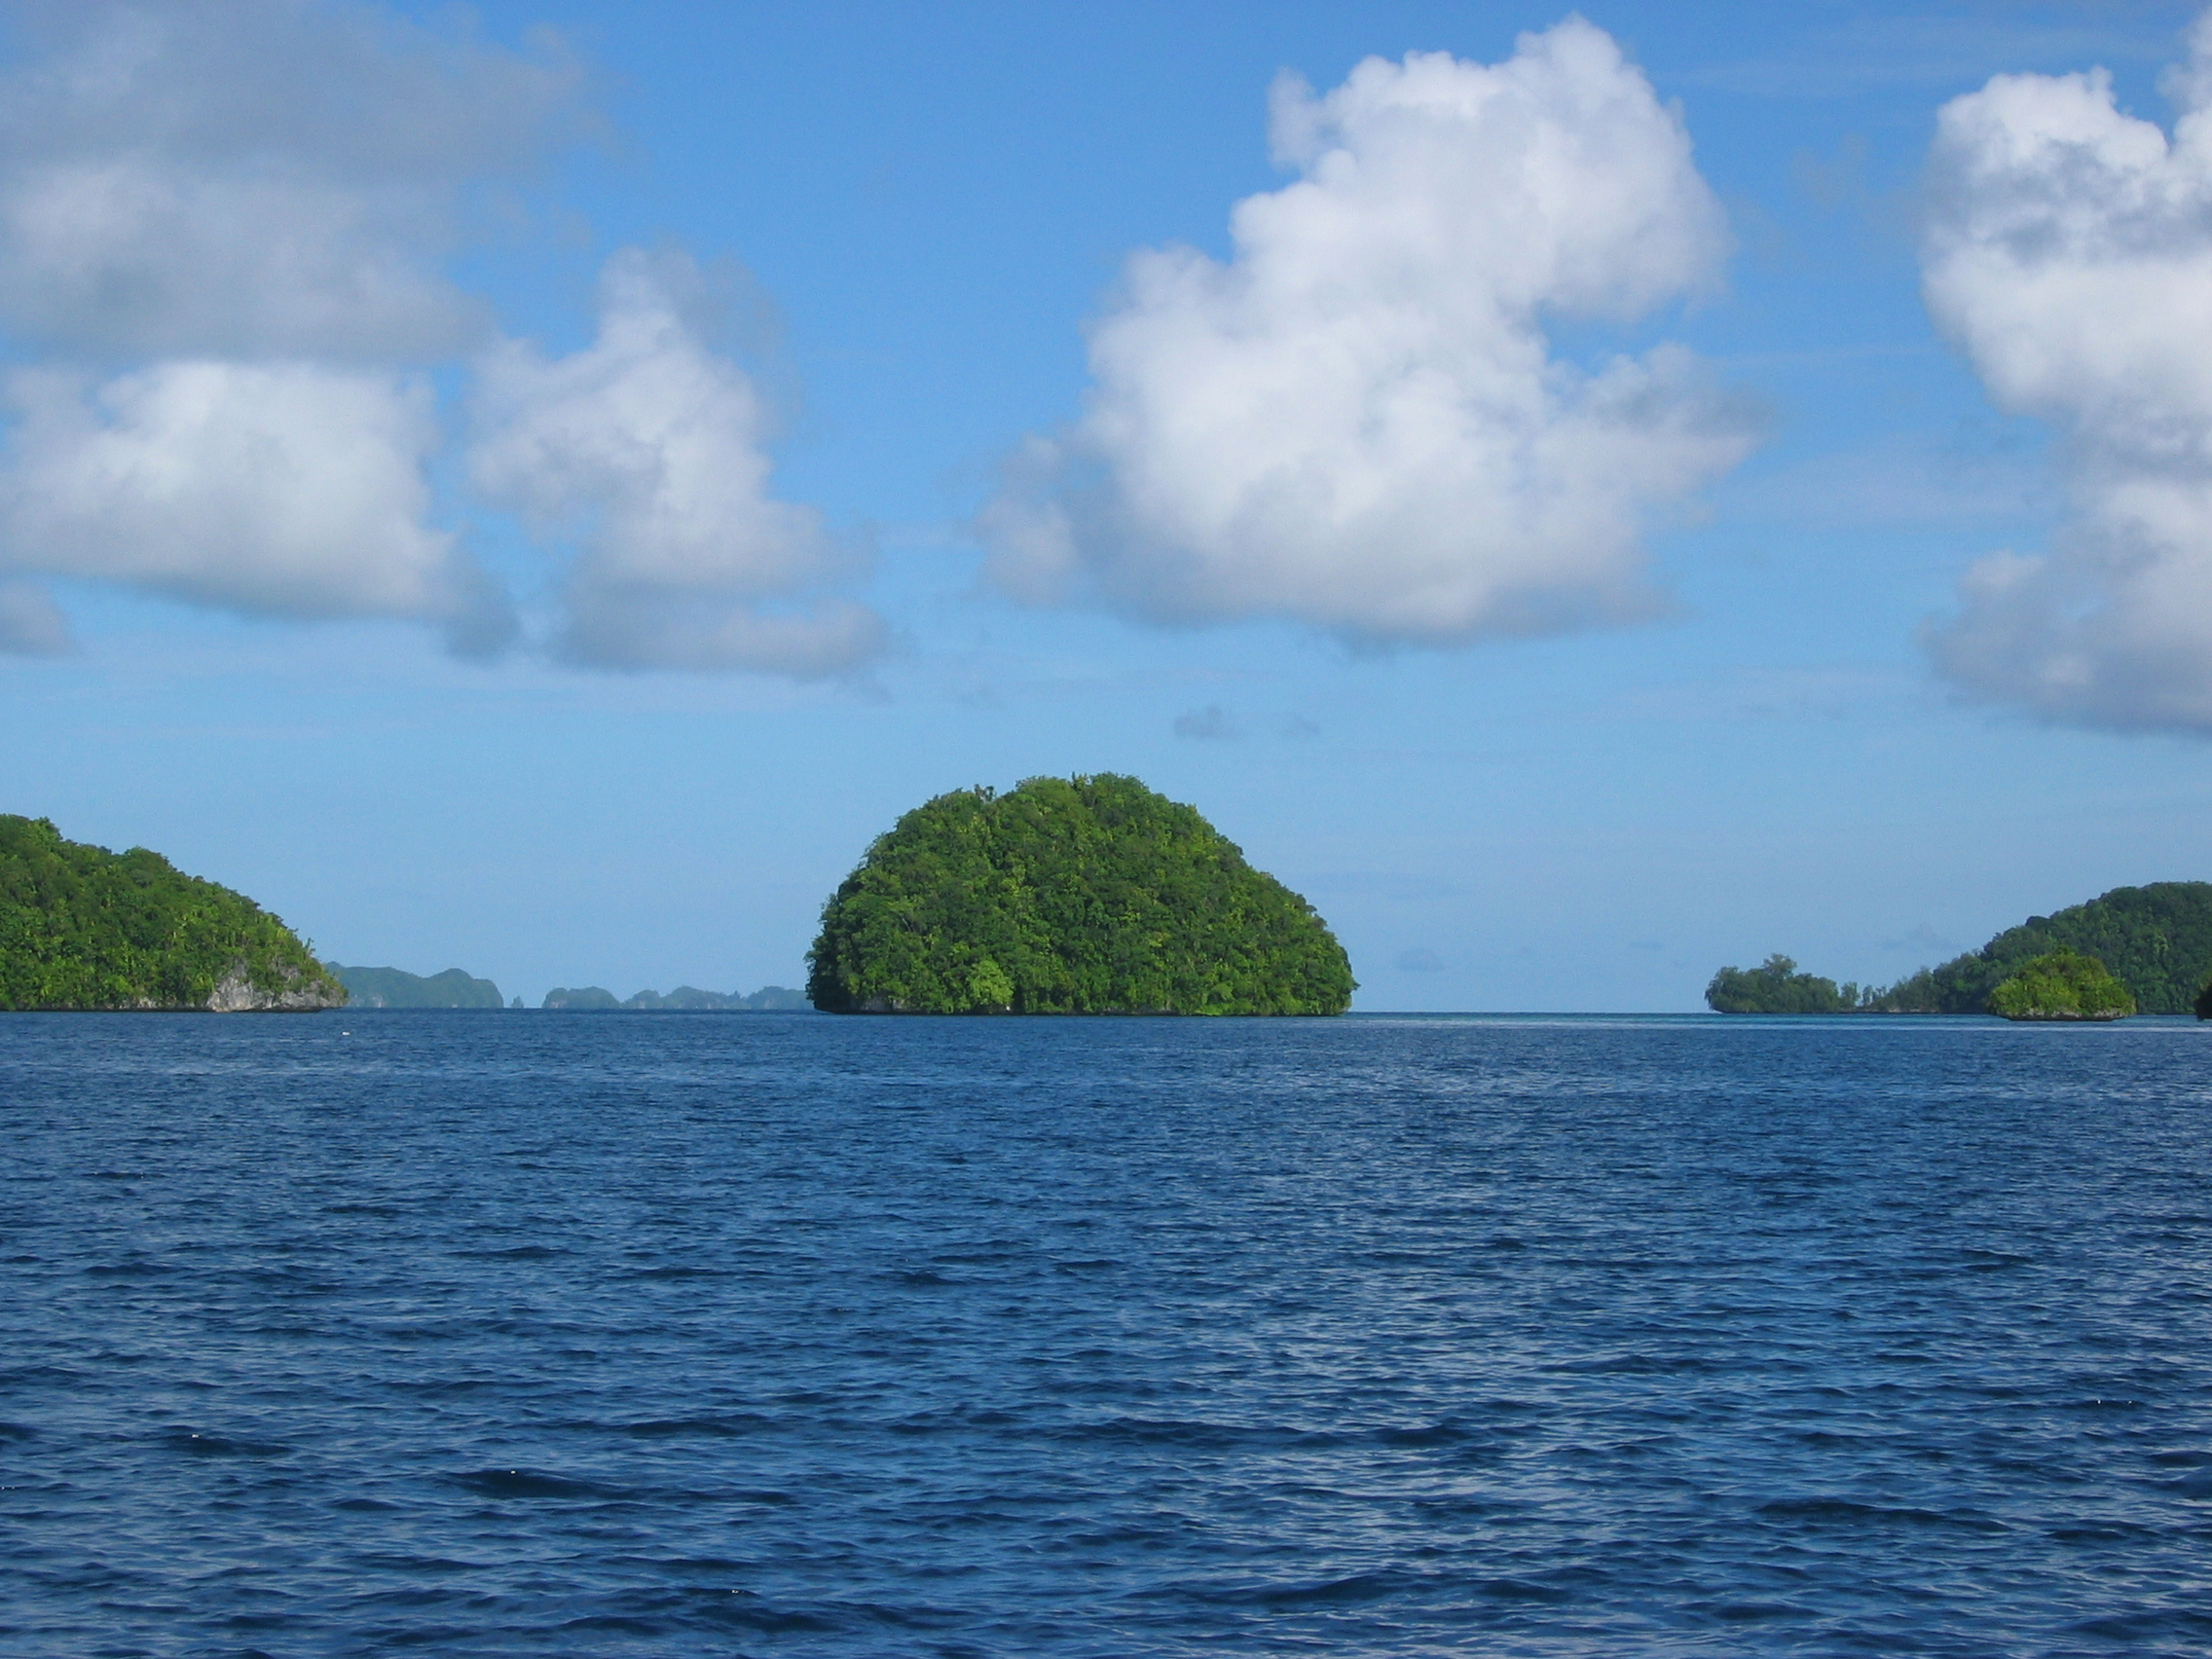 ttp://faculty.washington.edu/jsachs/lab/www/Research/Palau_Expedition_2004/LITTLEIS.JPG